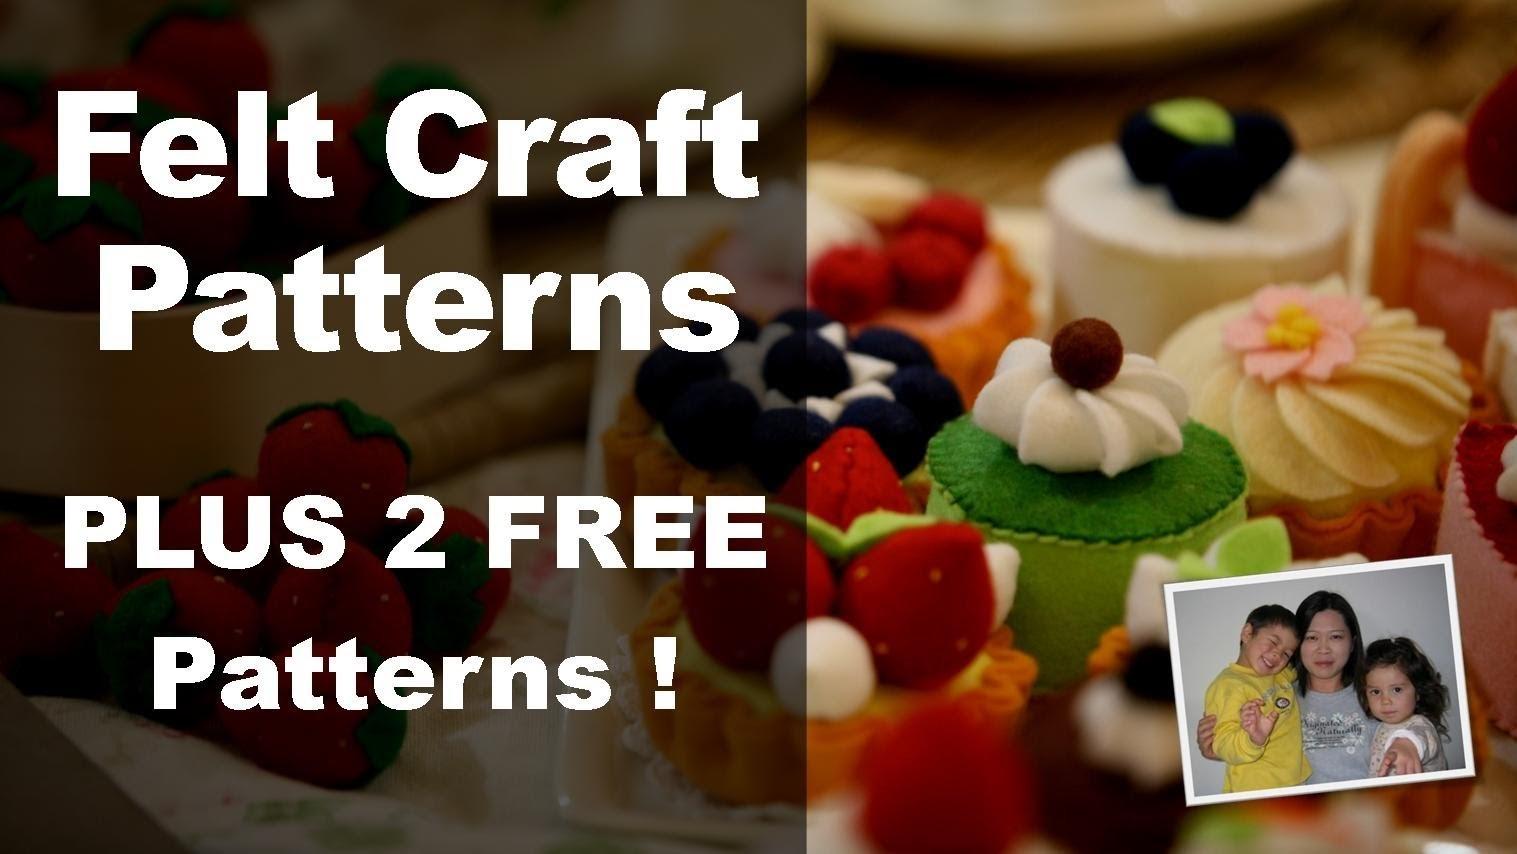 Felt Craft - Step by Step Felt Craft Food Patterns from